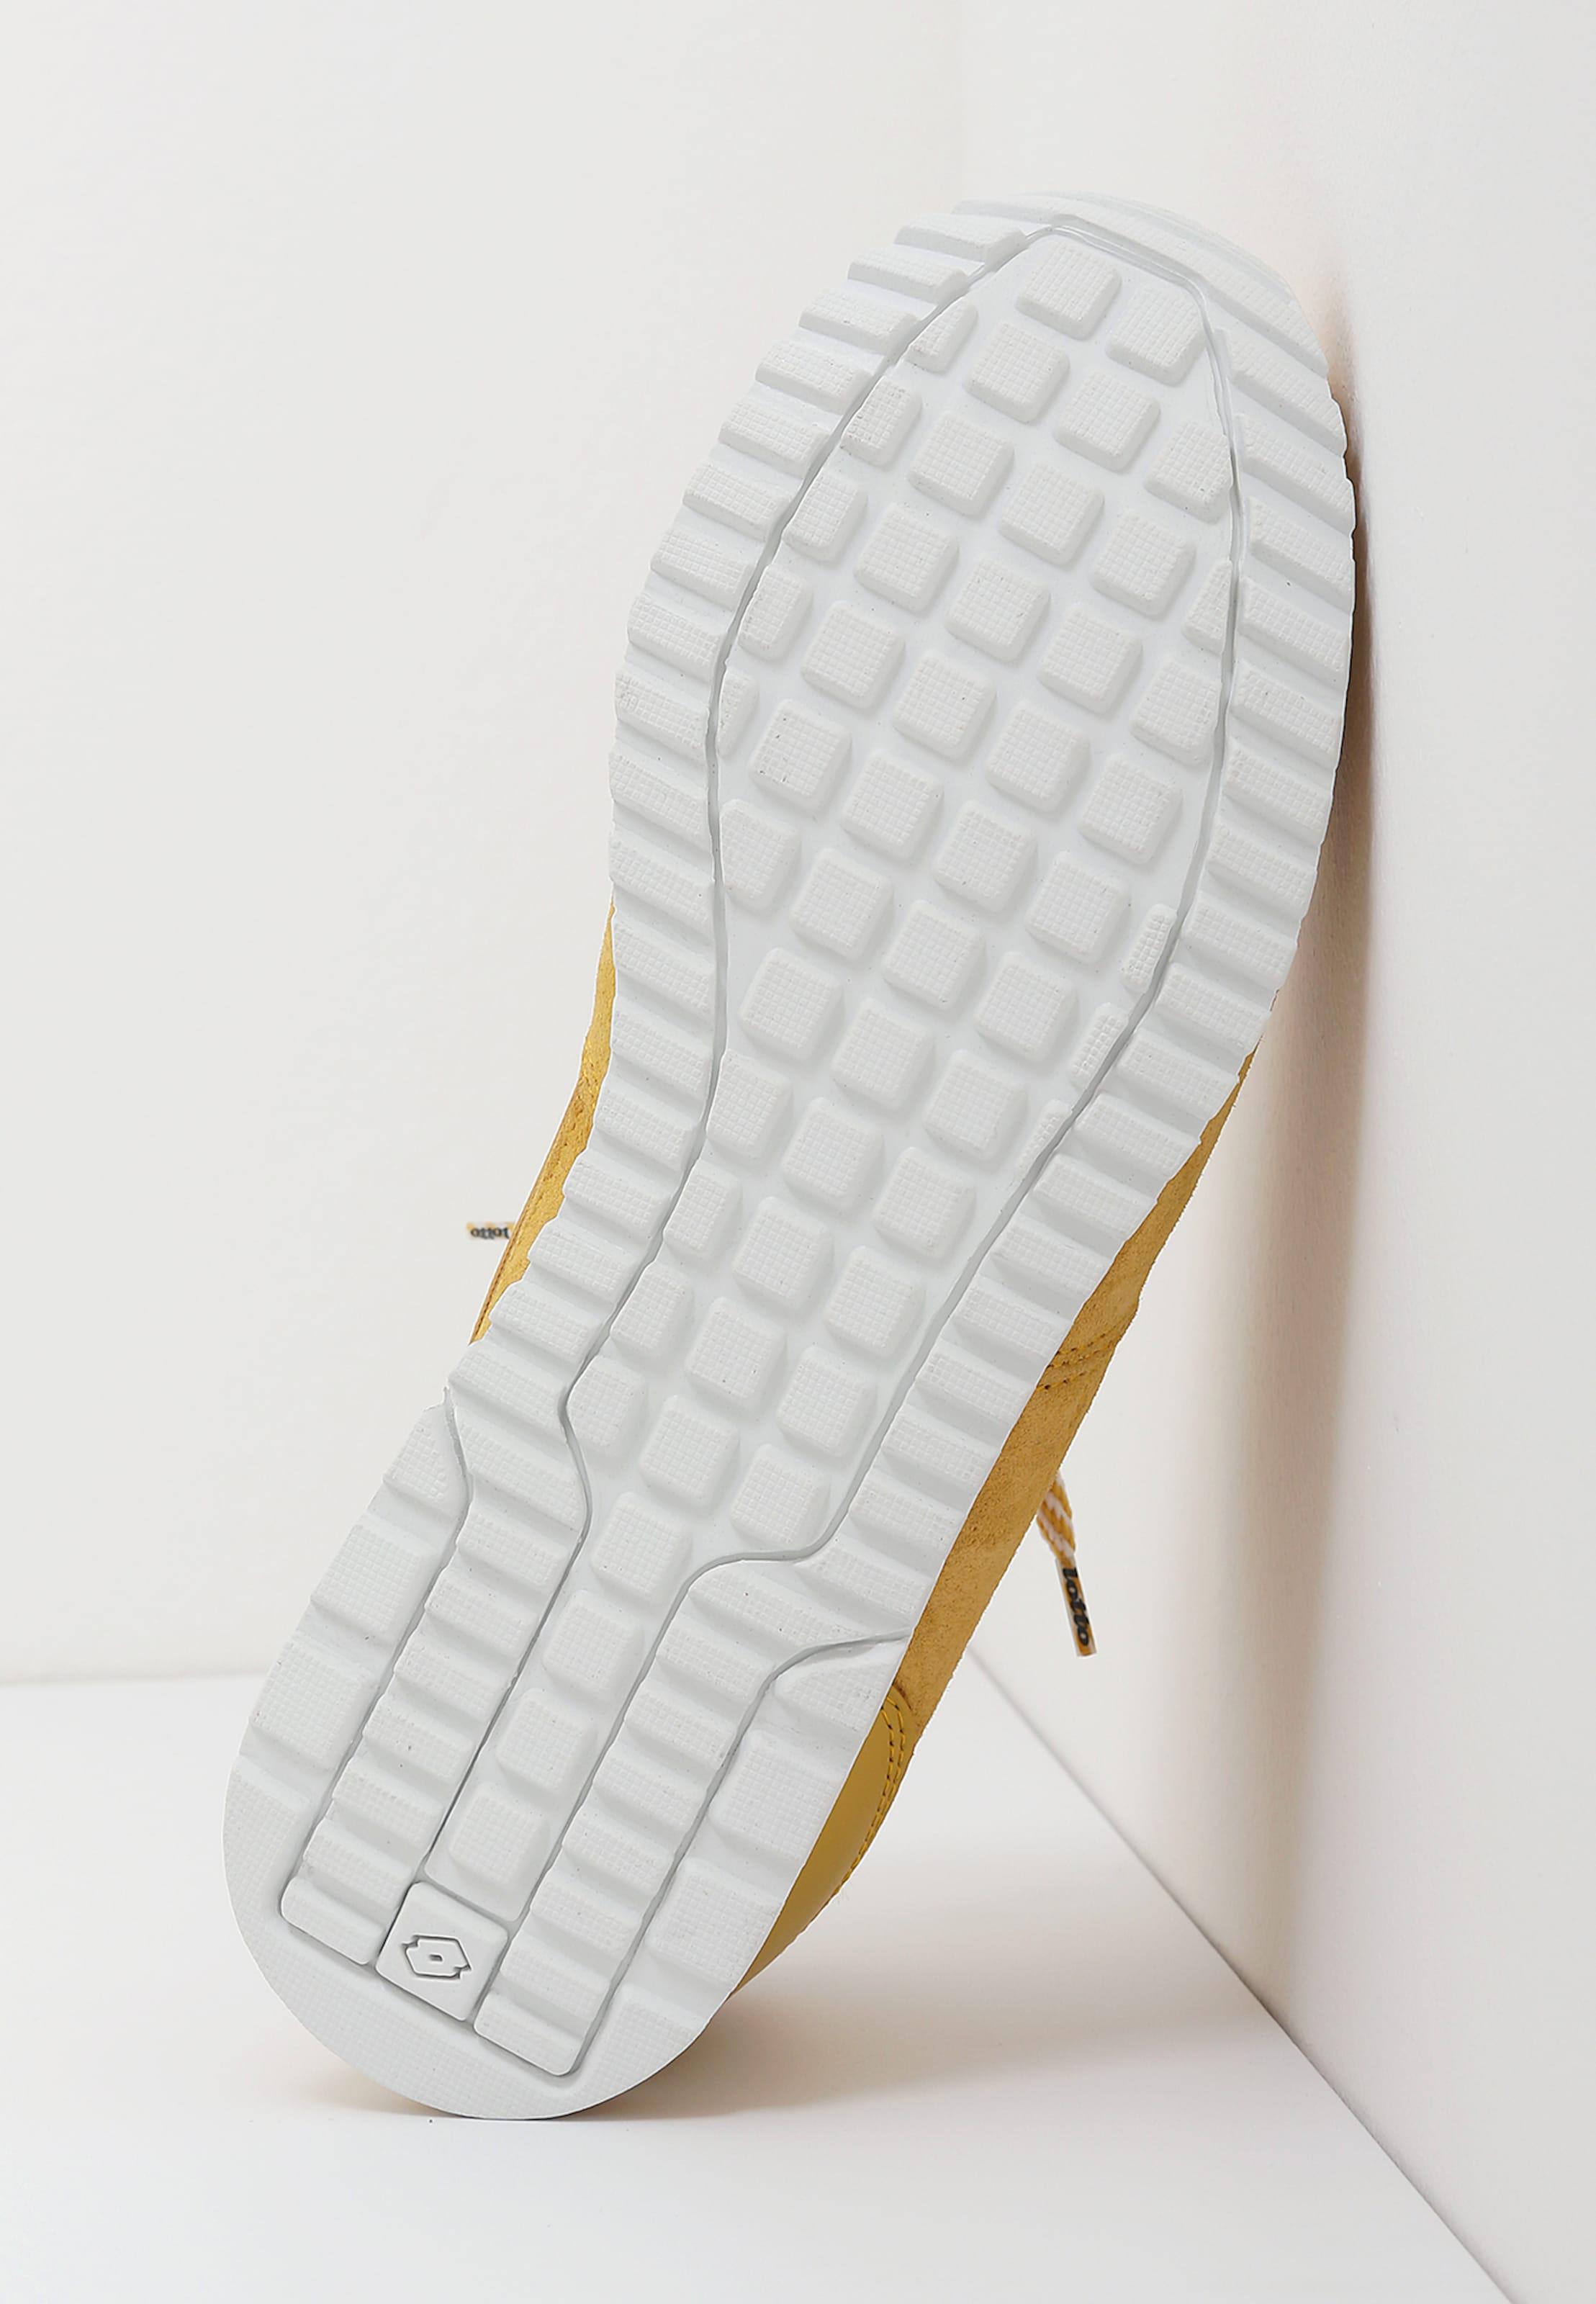 Sneaker Ginza' Lotto 'tokyo GoldgelbWeiß Leggenda In qVUGLSzMpj